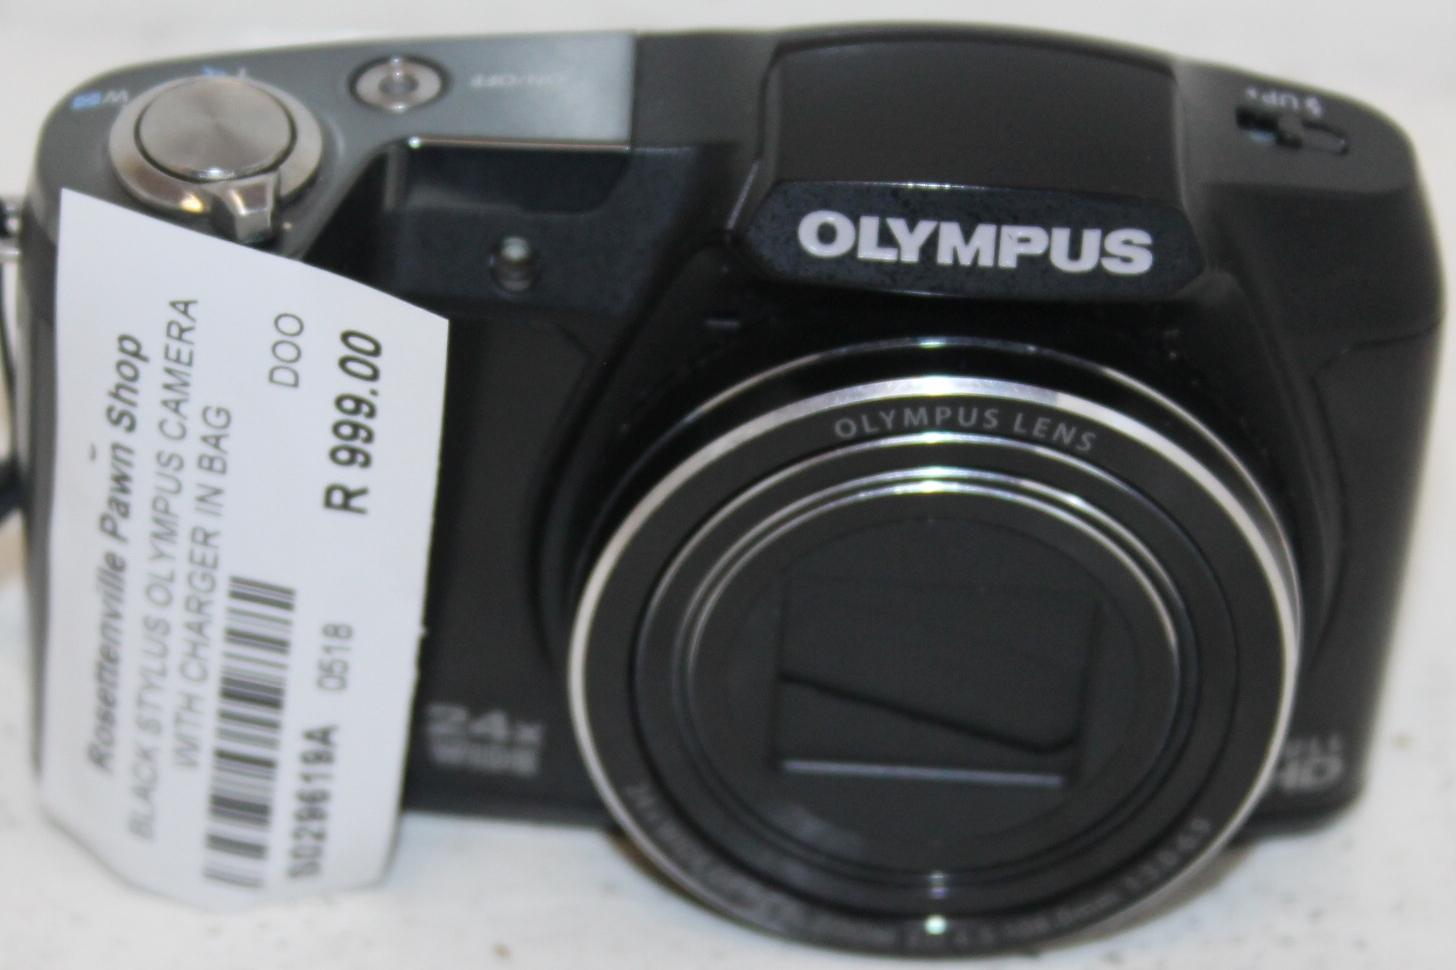 Stylus olympus camera S029619a #Rosettenvillepawnshop